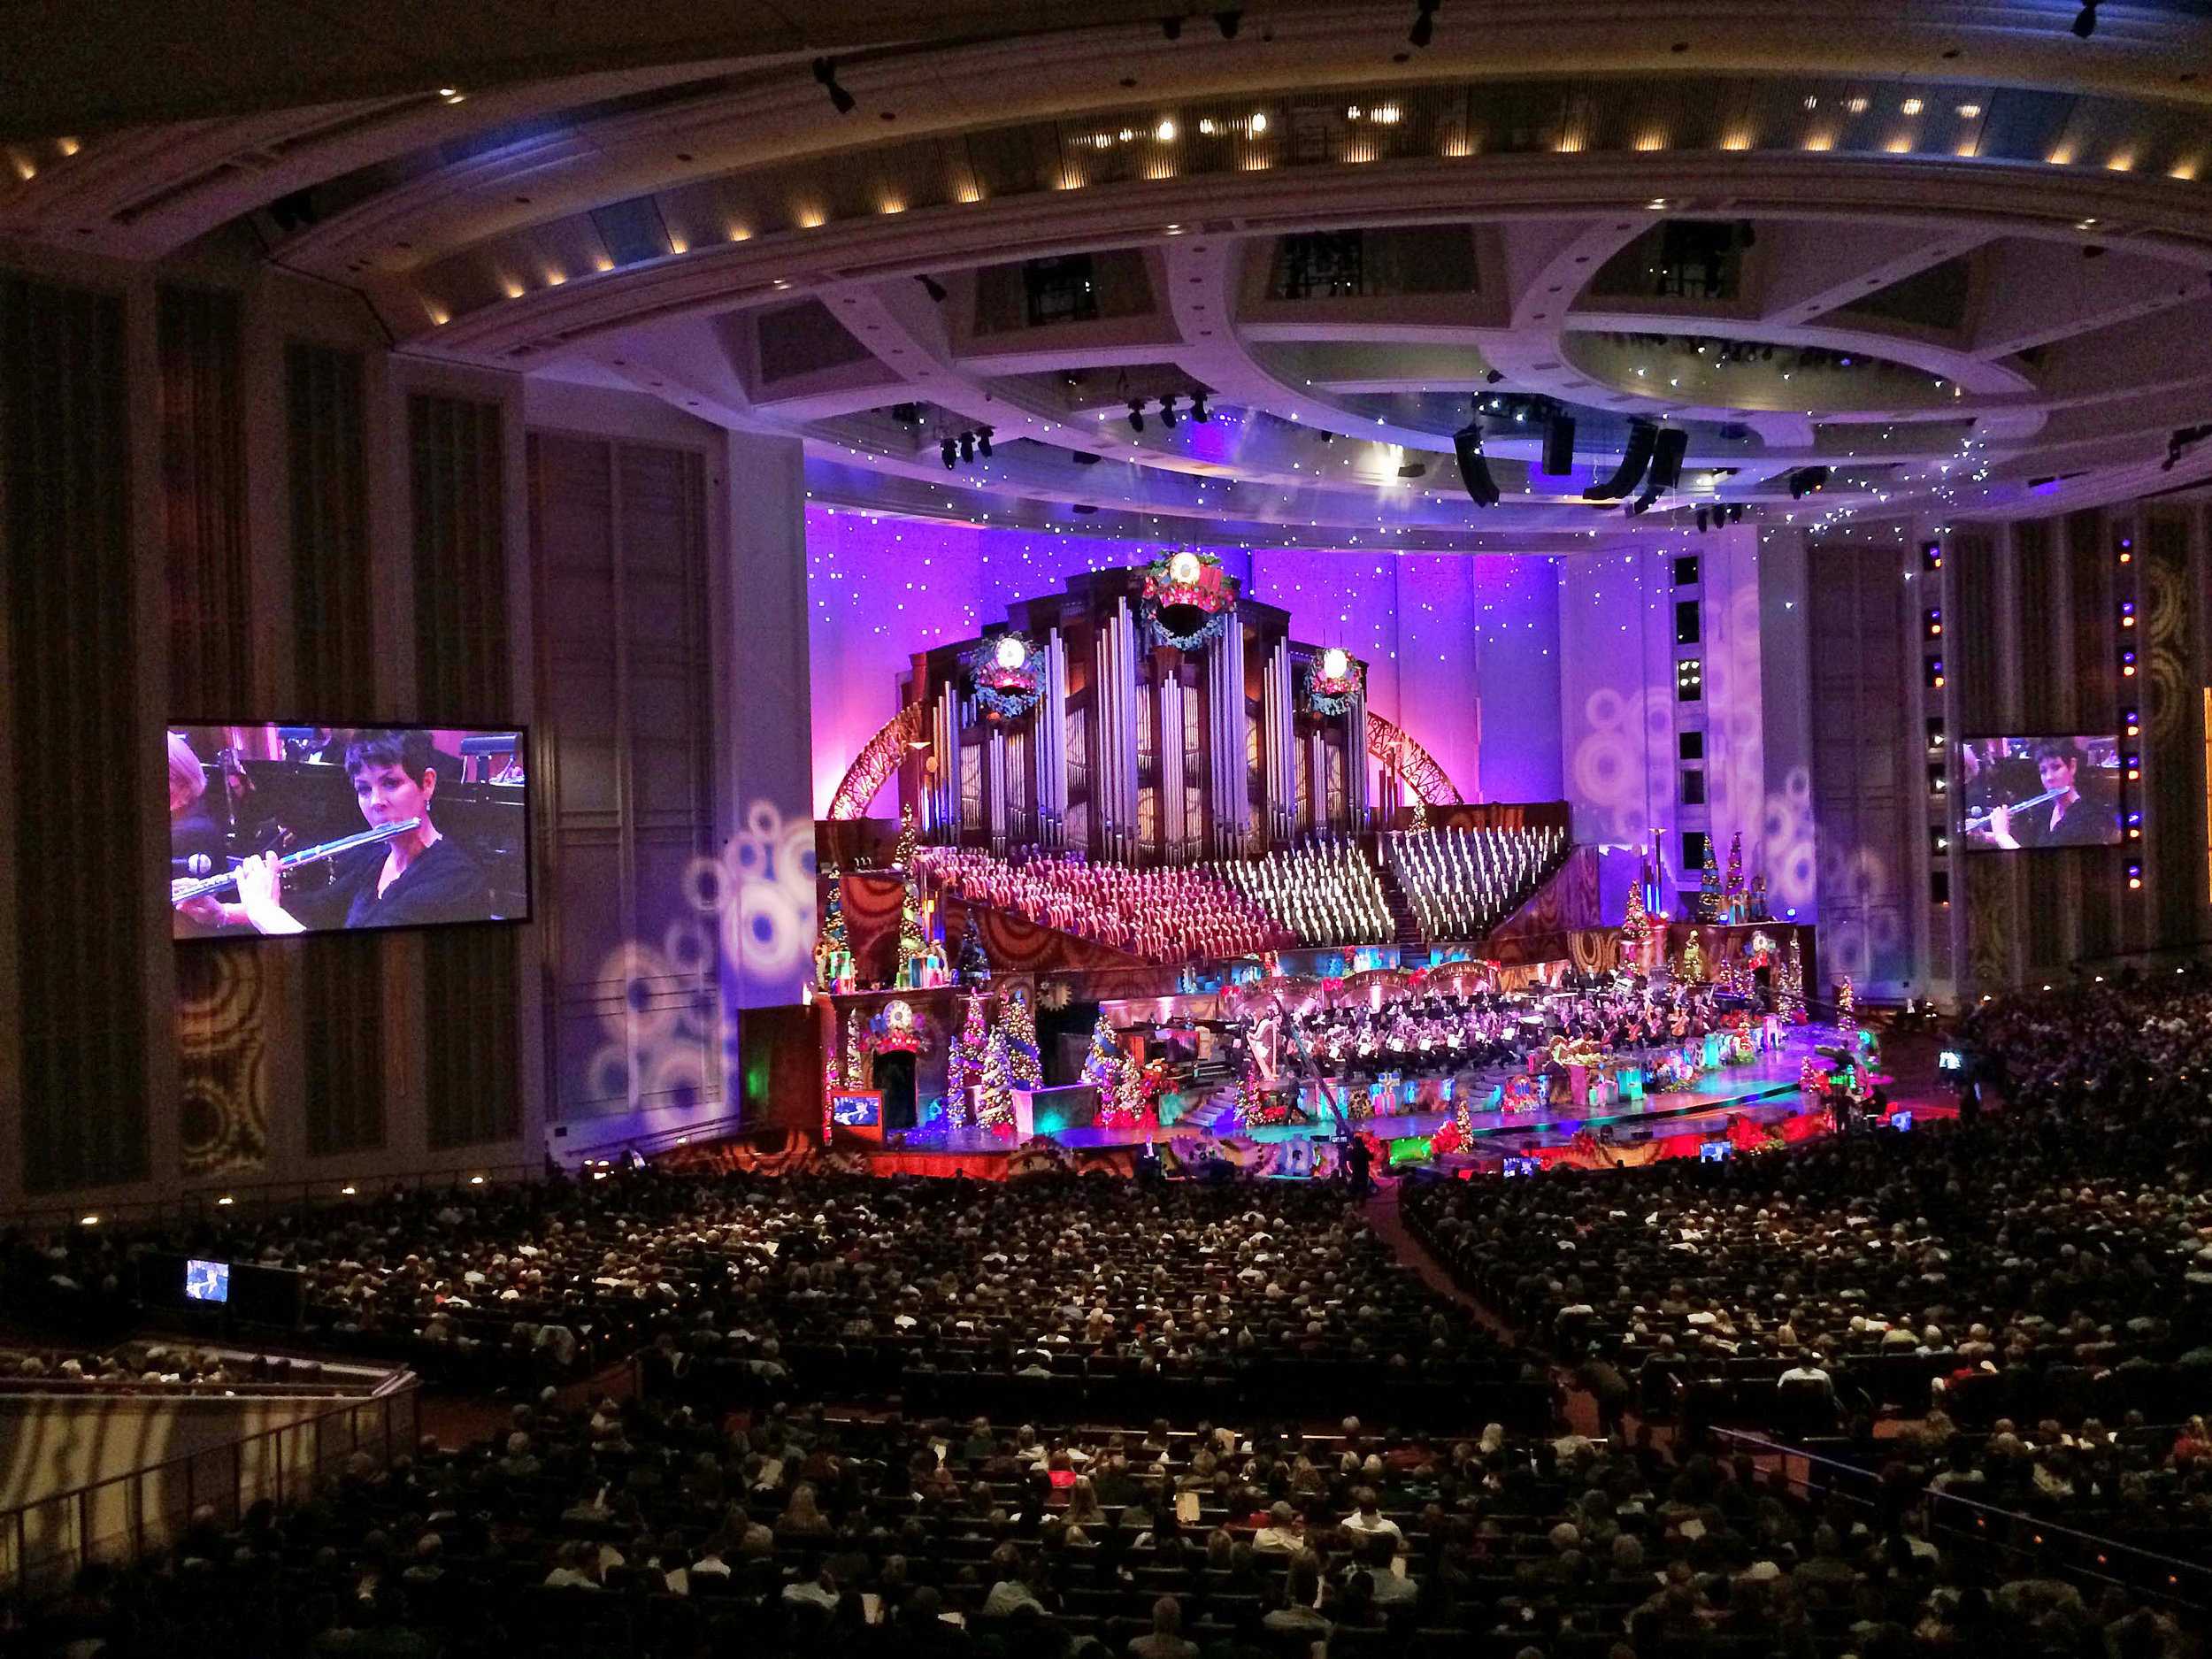 Jeannine Goeckeritz - Christmas Concert Conference Center - Flute Talk International Magazine Article.jpg